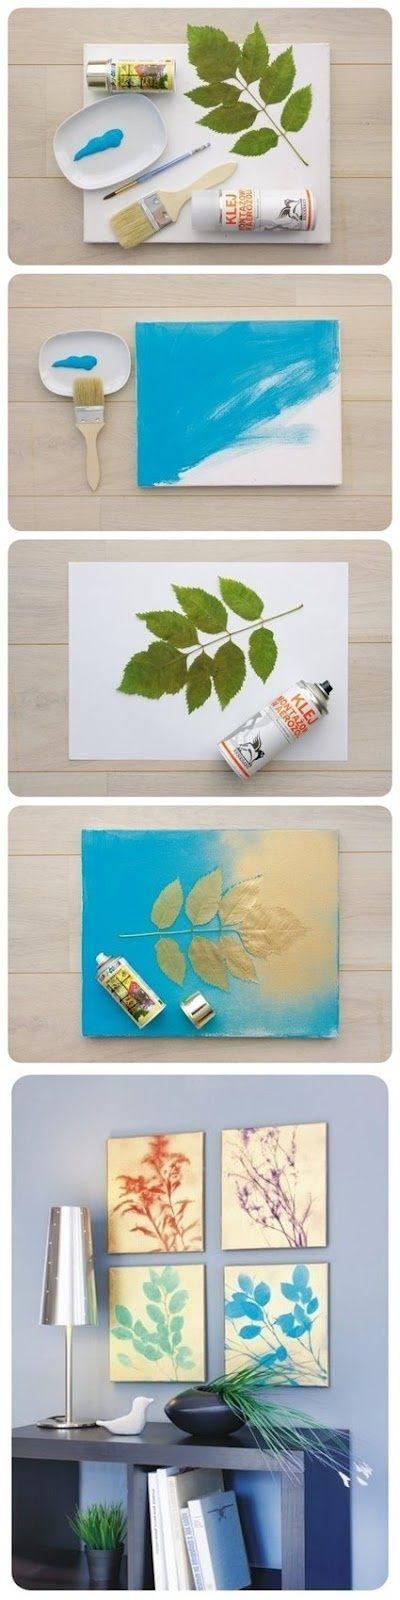 DIY Stenciled Nature Wall Art on Canvas - #diy